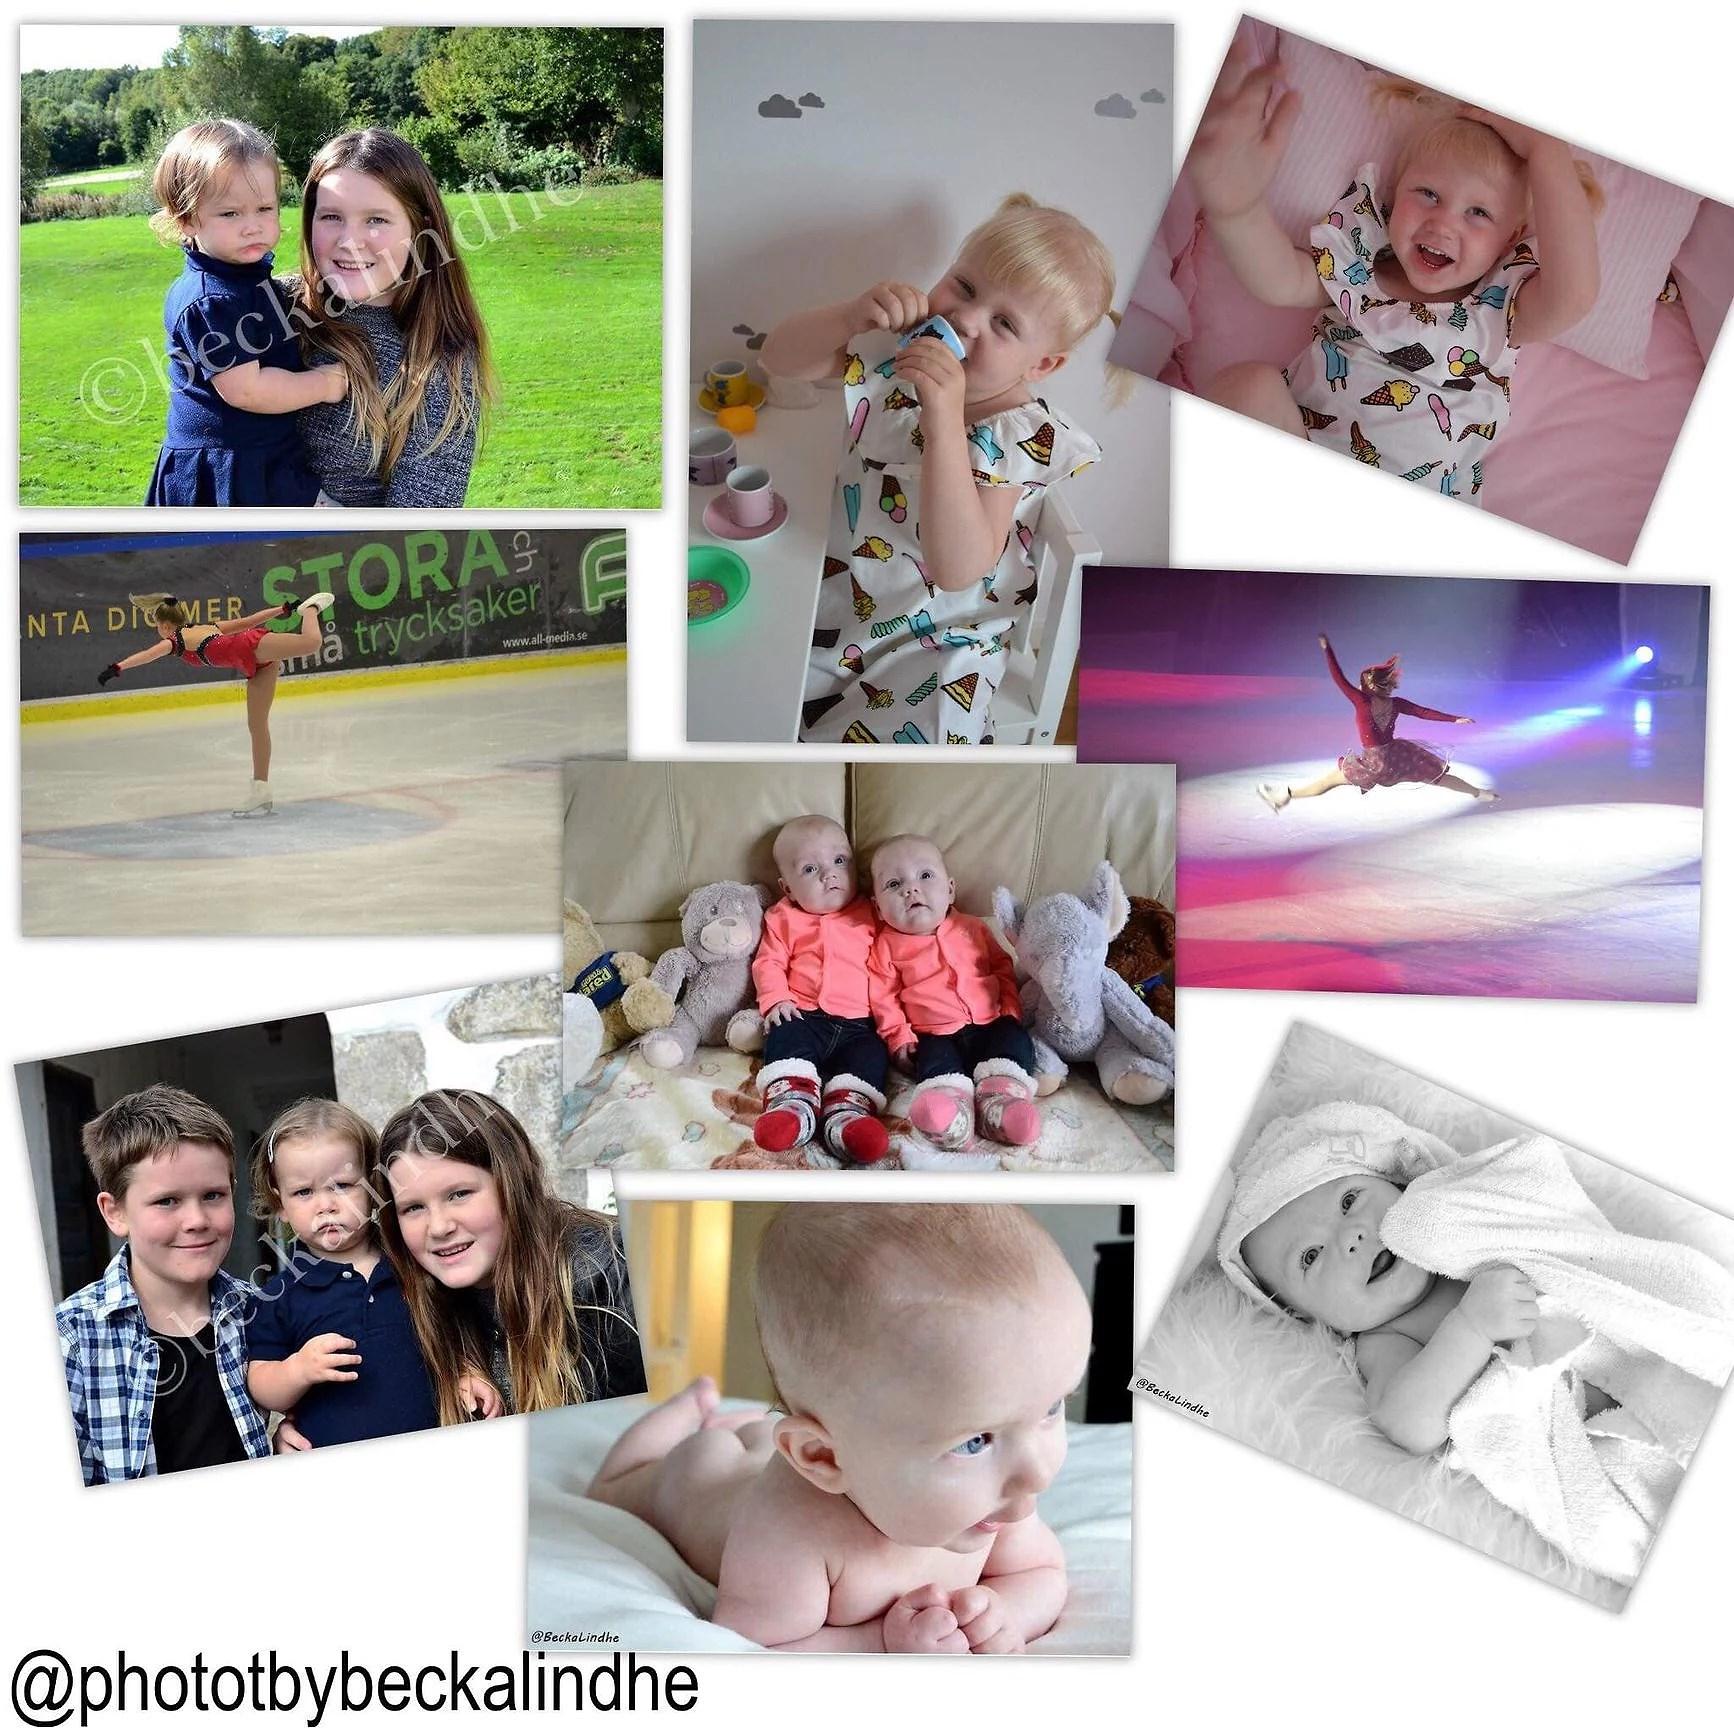 Pris & Fotograferingsregler!